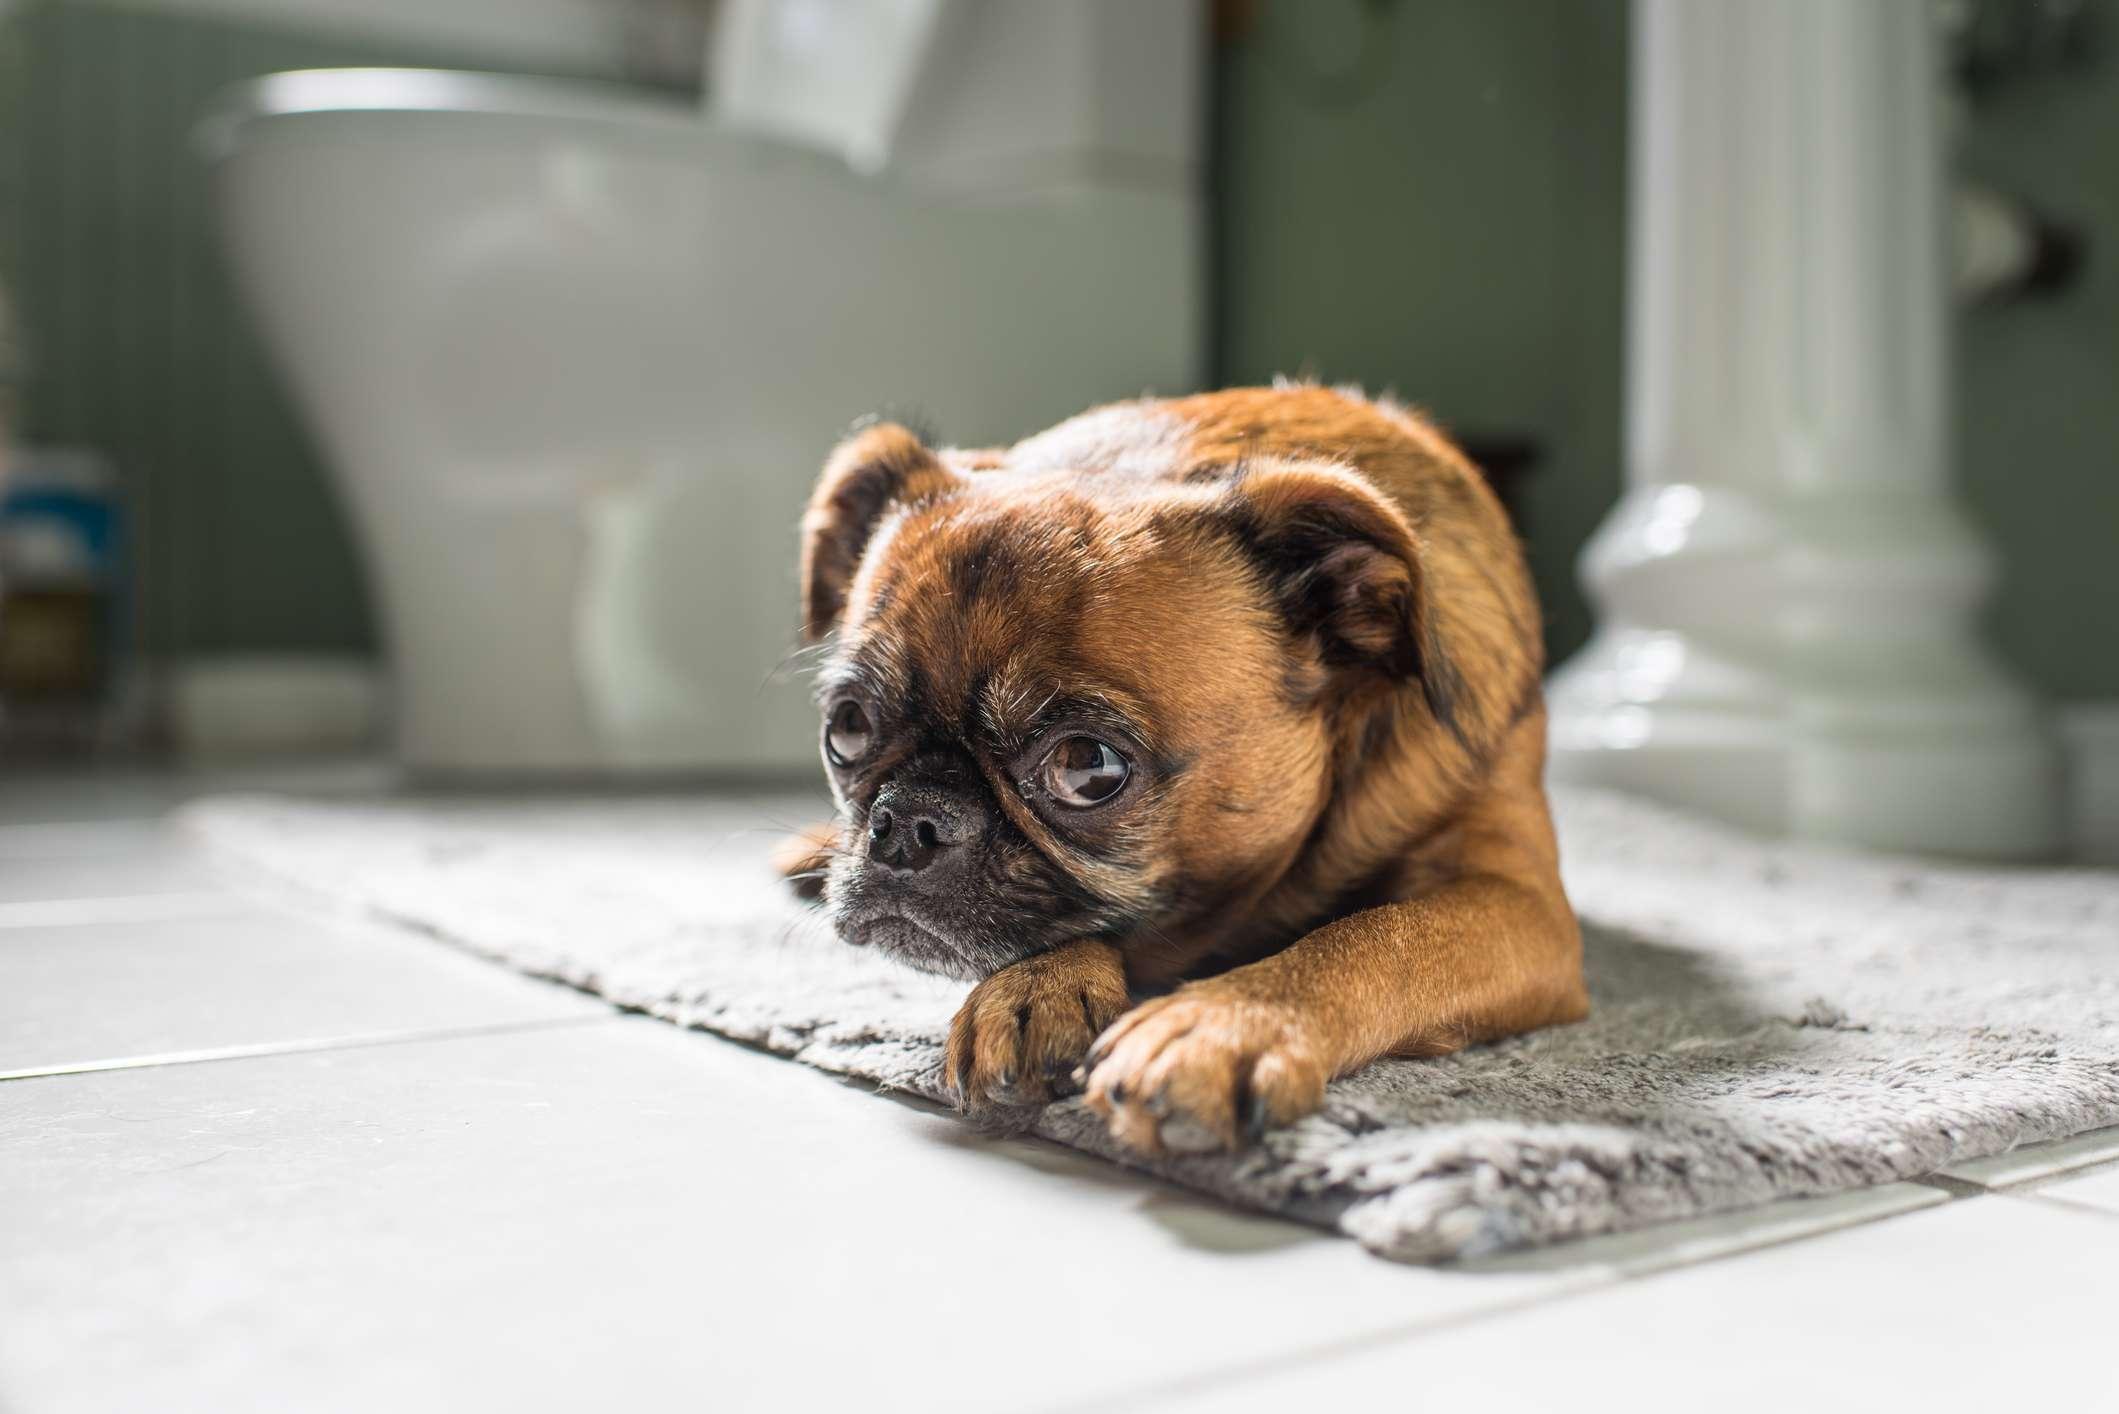 A brown and black pug-like little dog laying on the bathroom rug.